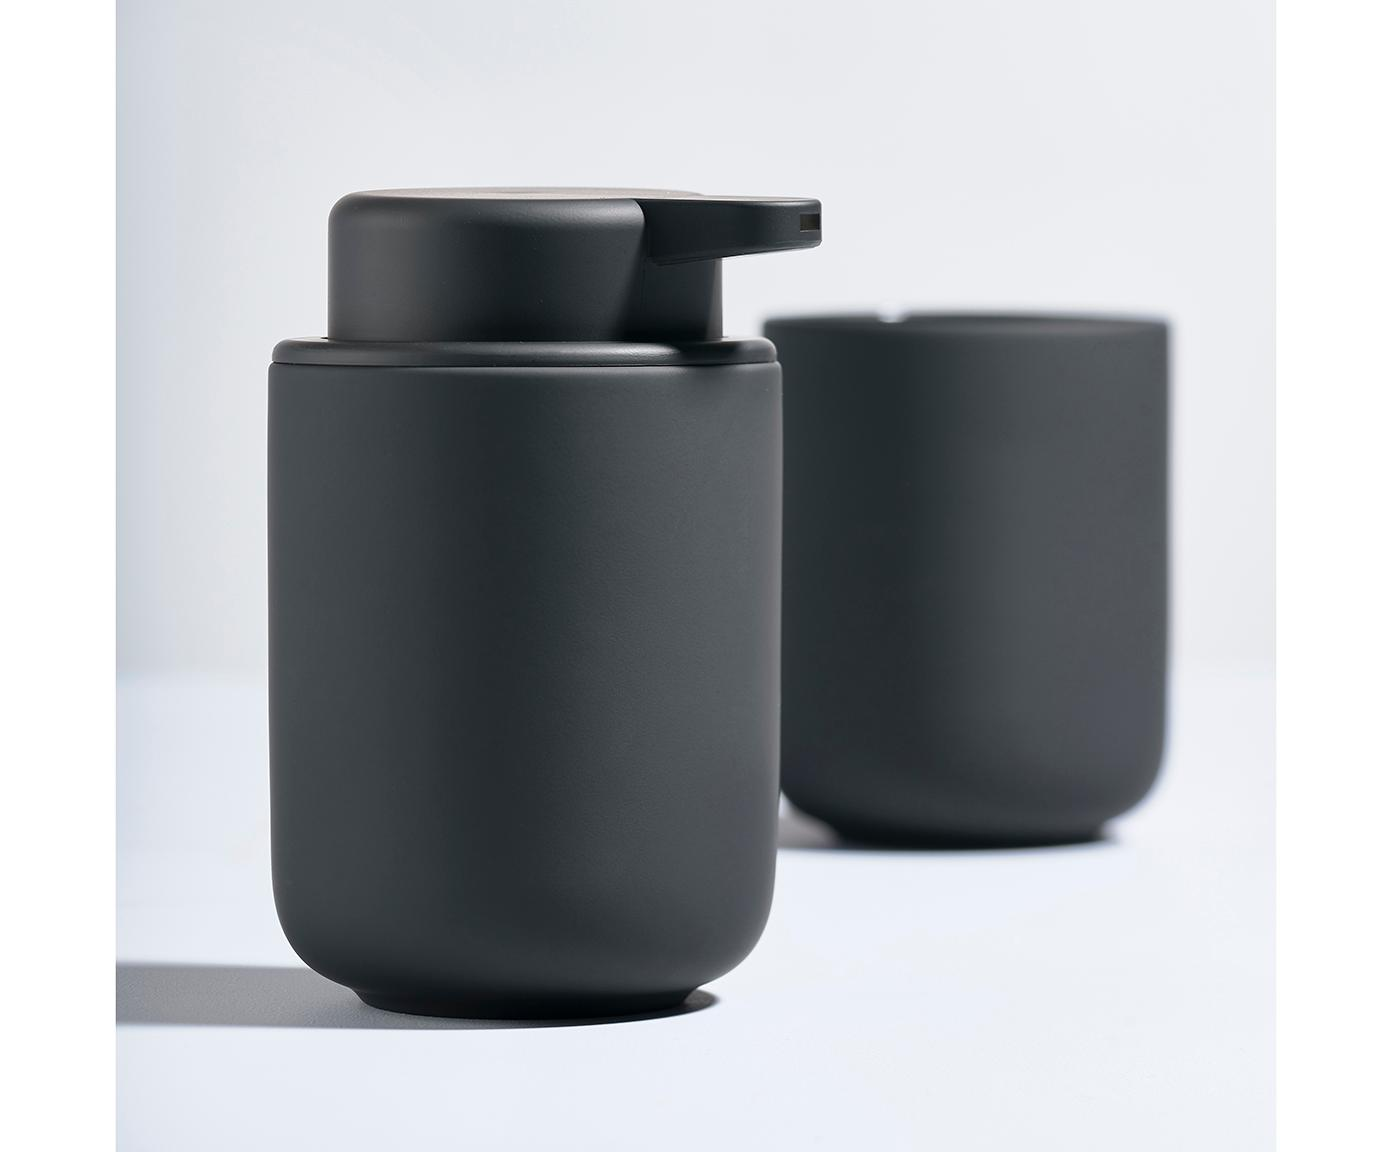 Tandenborstelbeker Omega, Keramiek overtrokken met soft-touch oppervlak (kunststof), Mat zwart, Ø 8 x H 10 cm